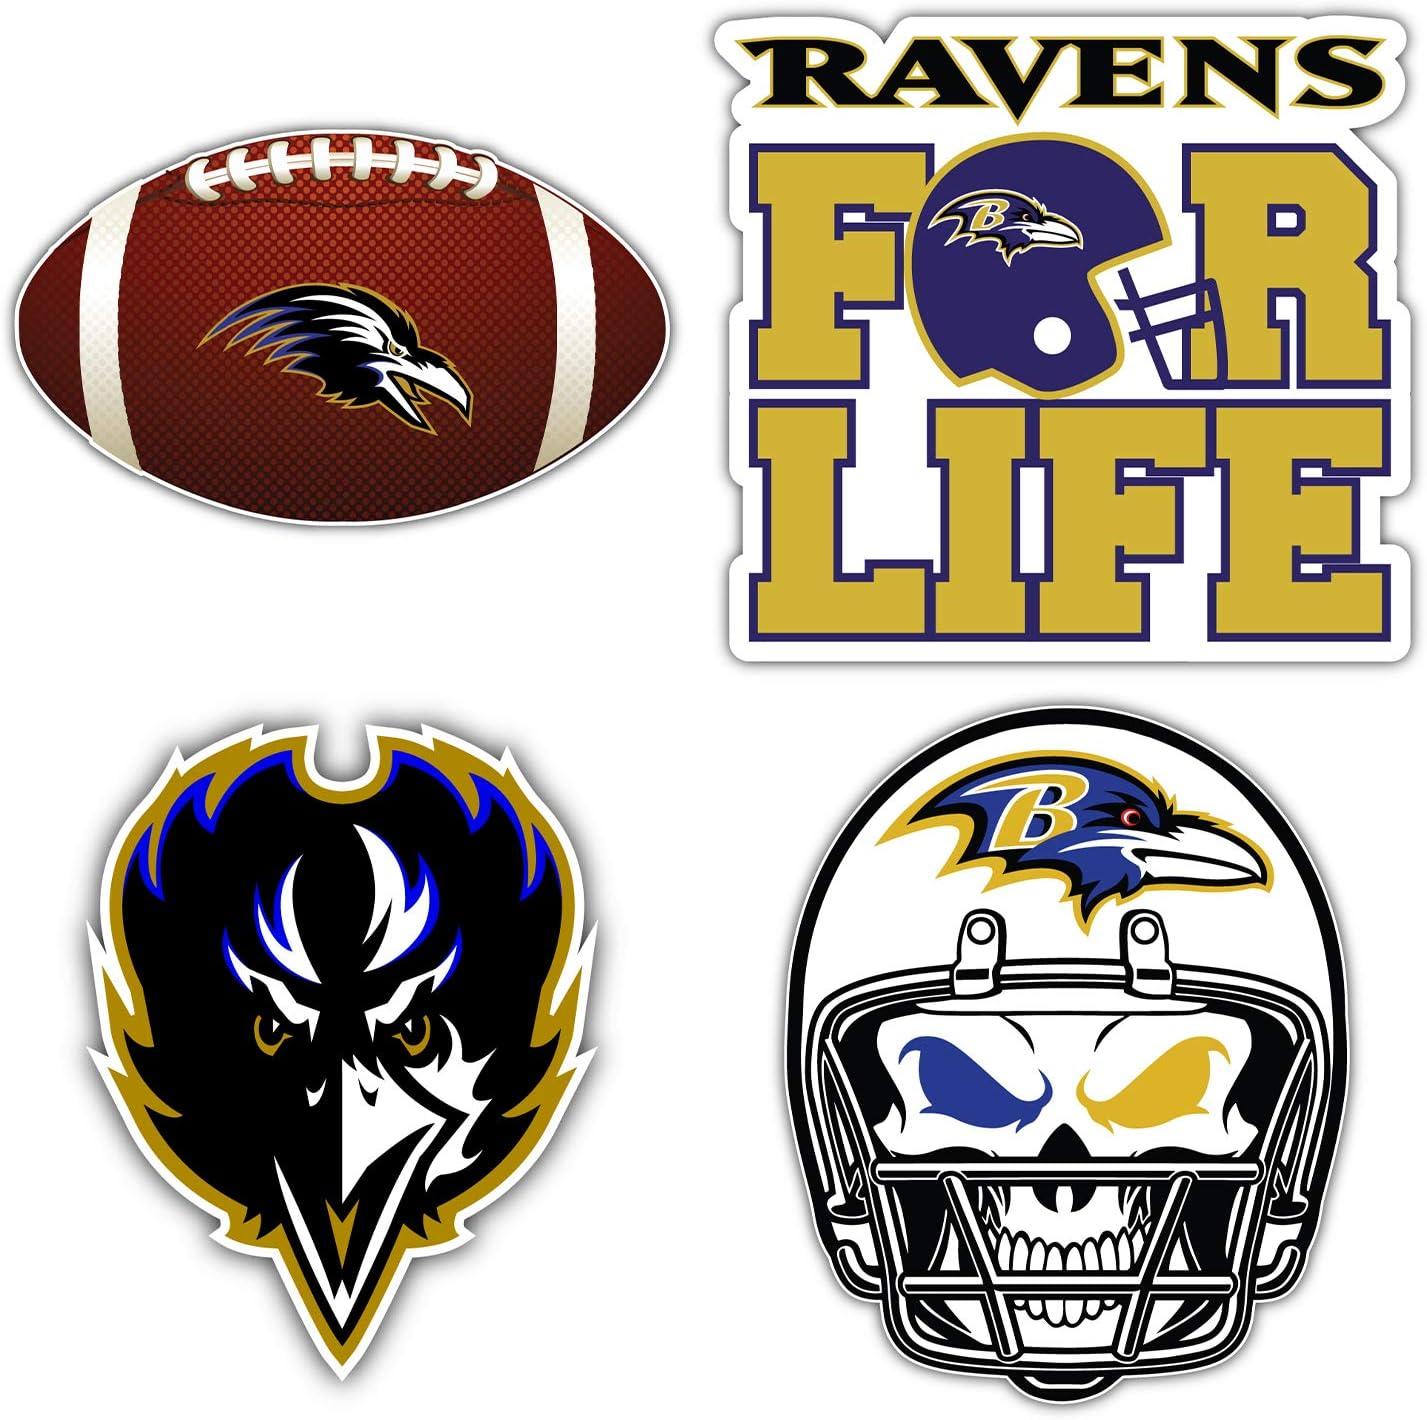 qualityprint Baltimore Ravens Set of 4 NFL Football Car Bumper Stickers Decals 5 Longer Side